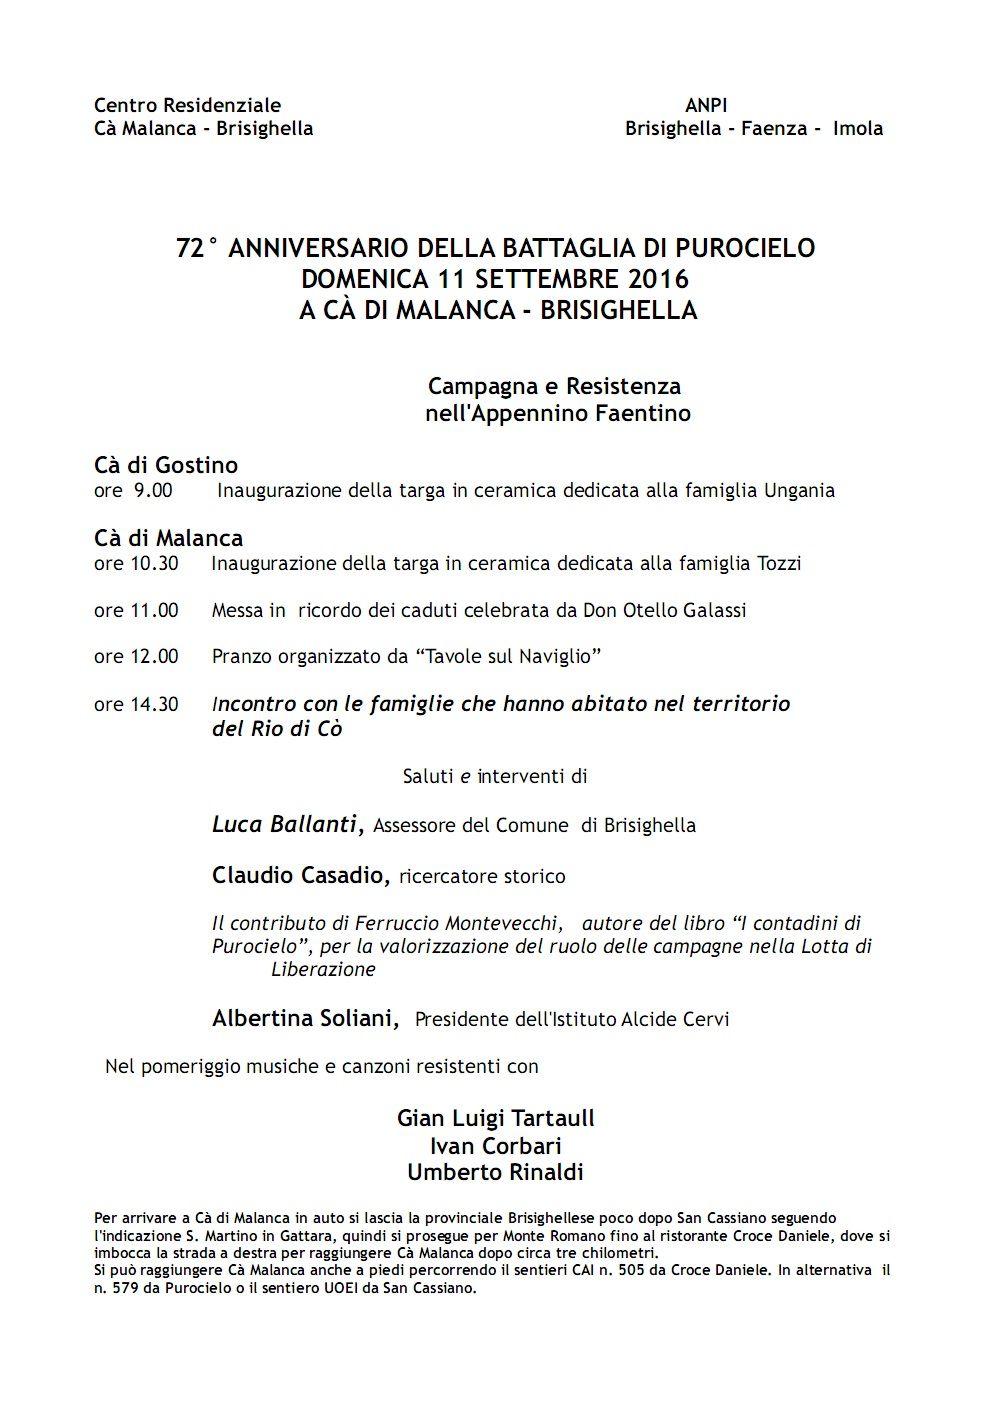 72mo_Purocielo_11-9-16_BrisighellaFaenzaImola